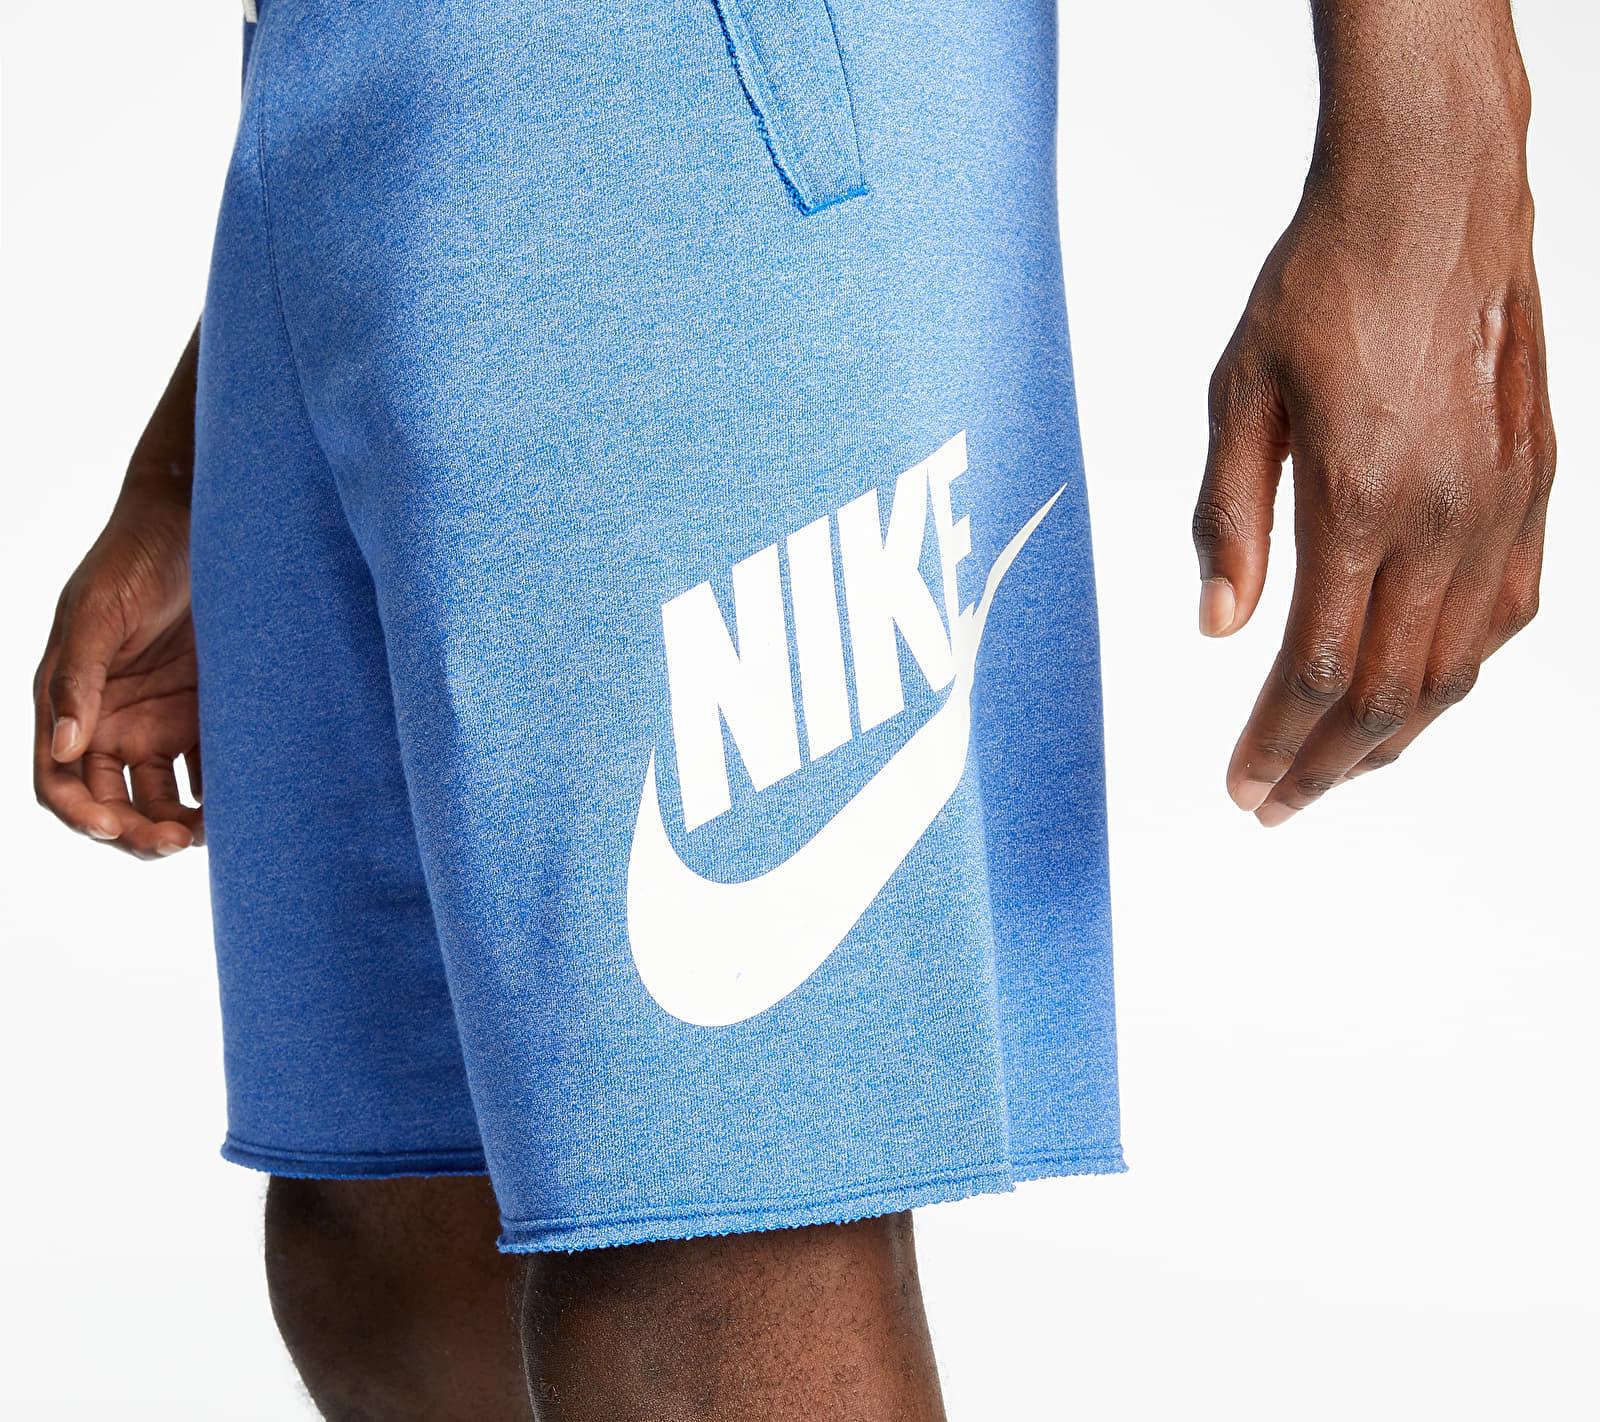 Nike Sportswear SCE Ft Alumni Shorts Game Royal/ Htr/ Sail/ Sail, Blue